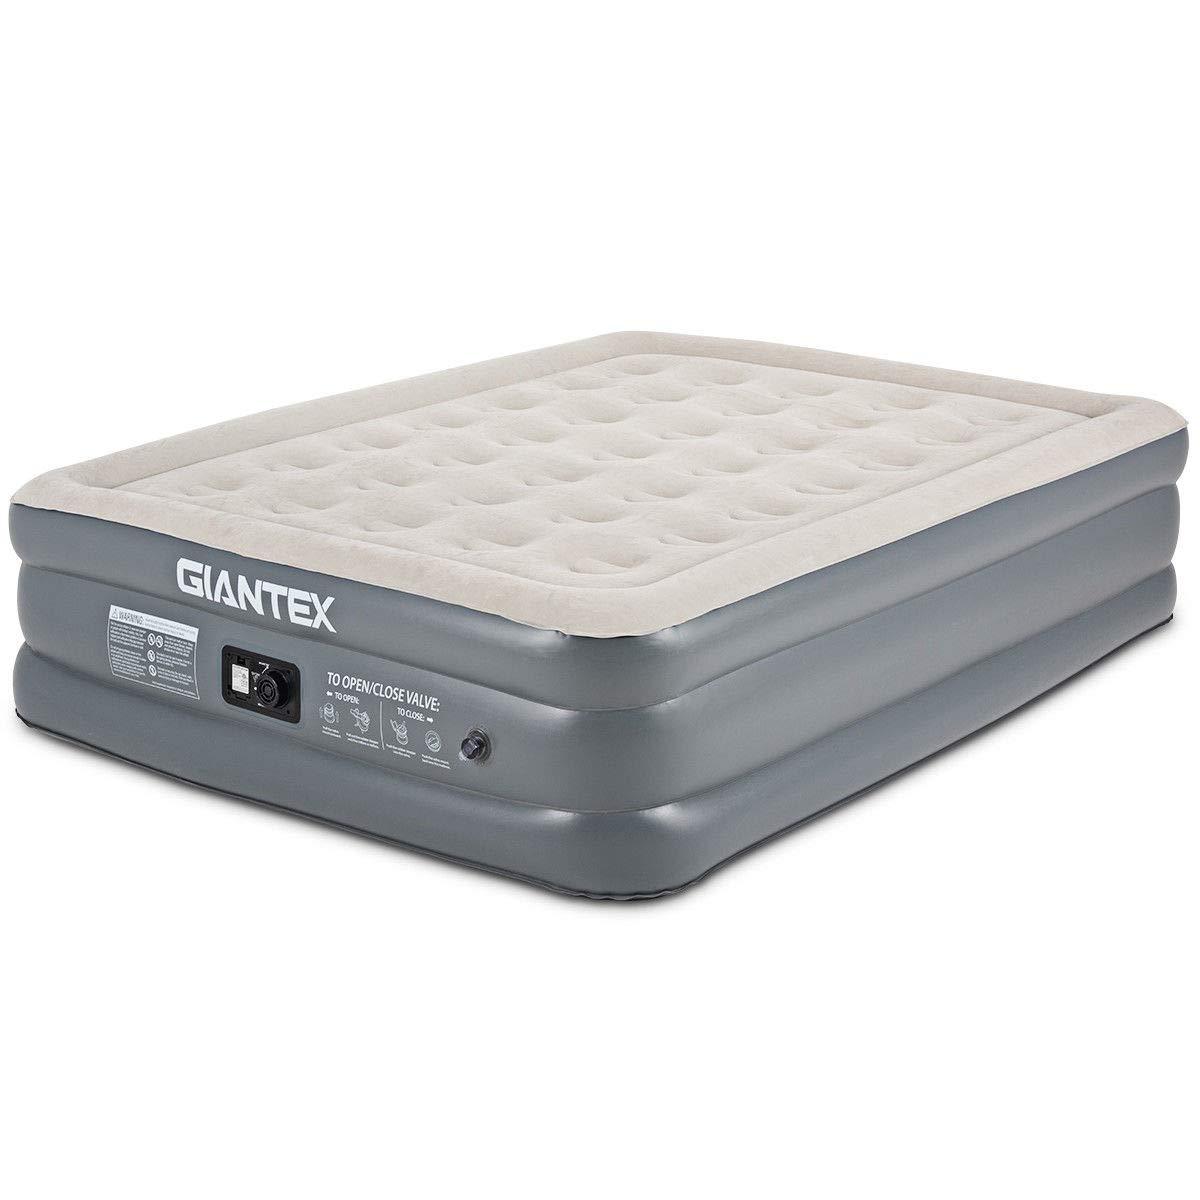 Giantex Air Mattress Luxury Airbed with Comfort Technology & Internal High Capacity Pump Inflatable Mattress (Queen)